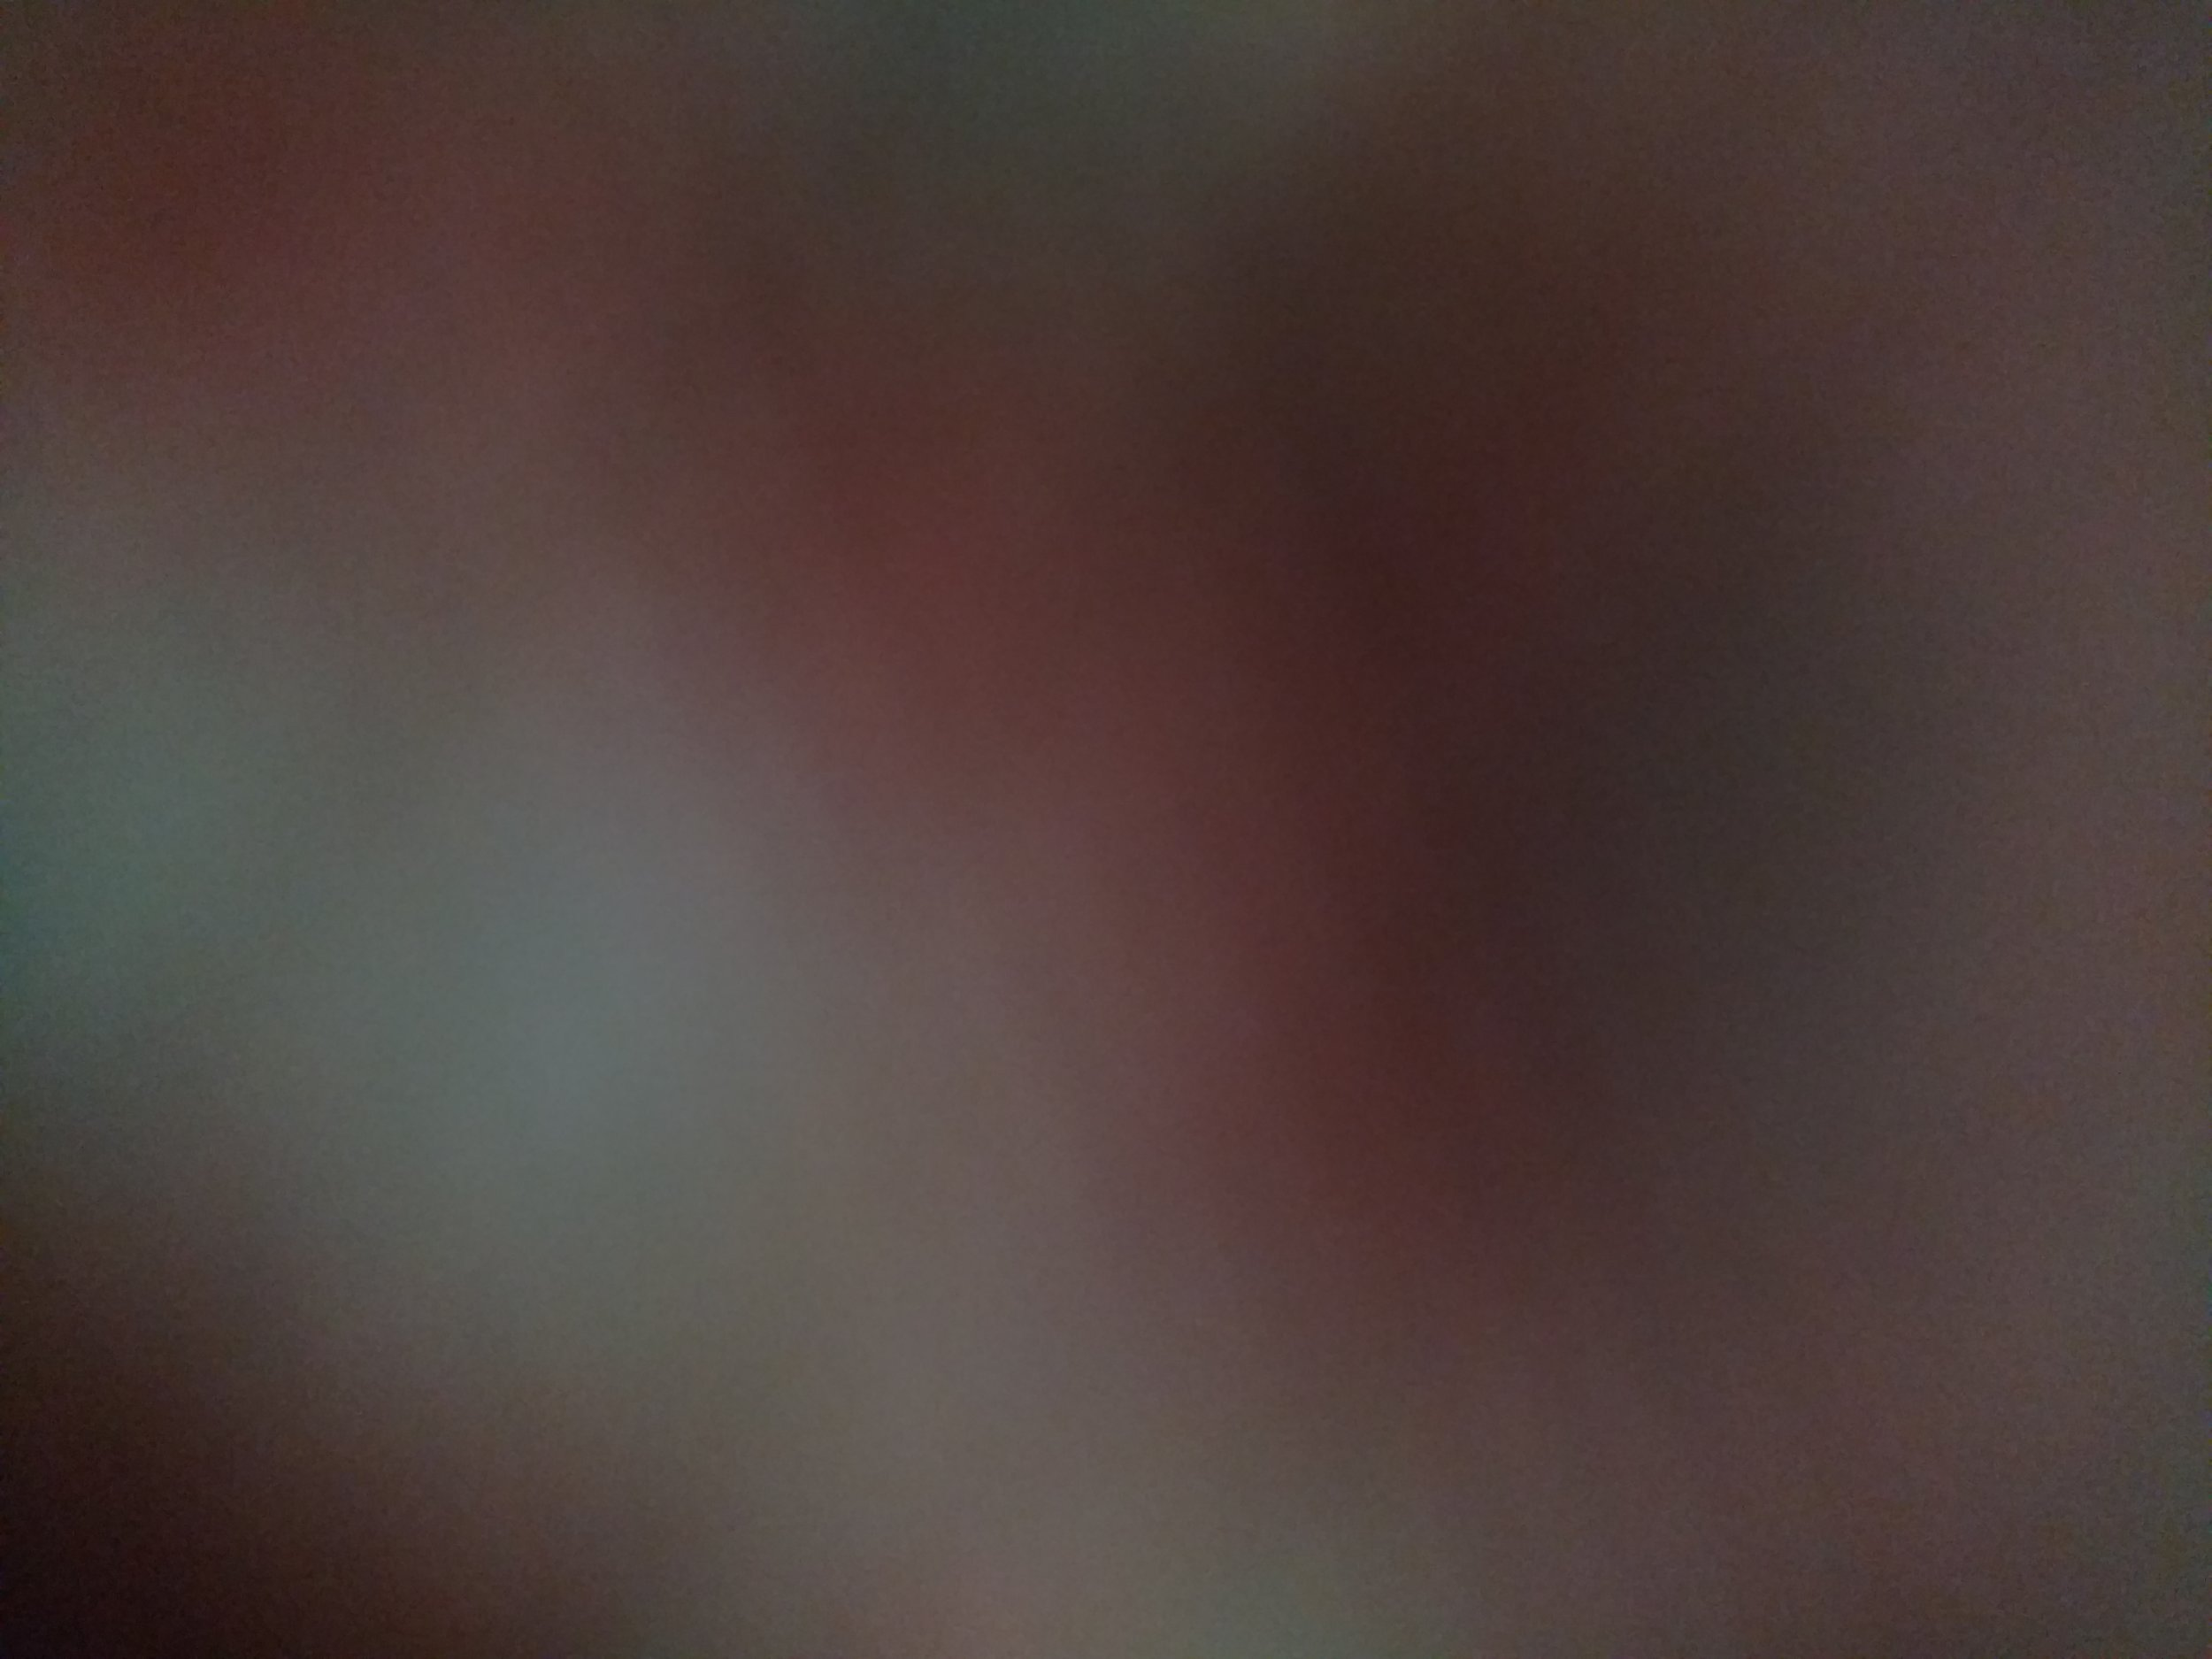 willroth-co-free-texture-gradient-076.jpg